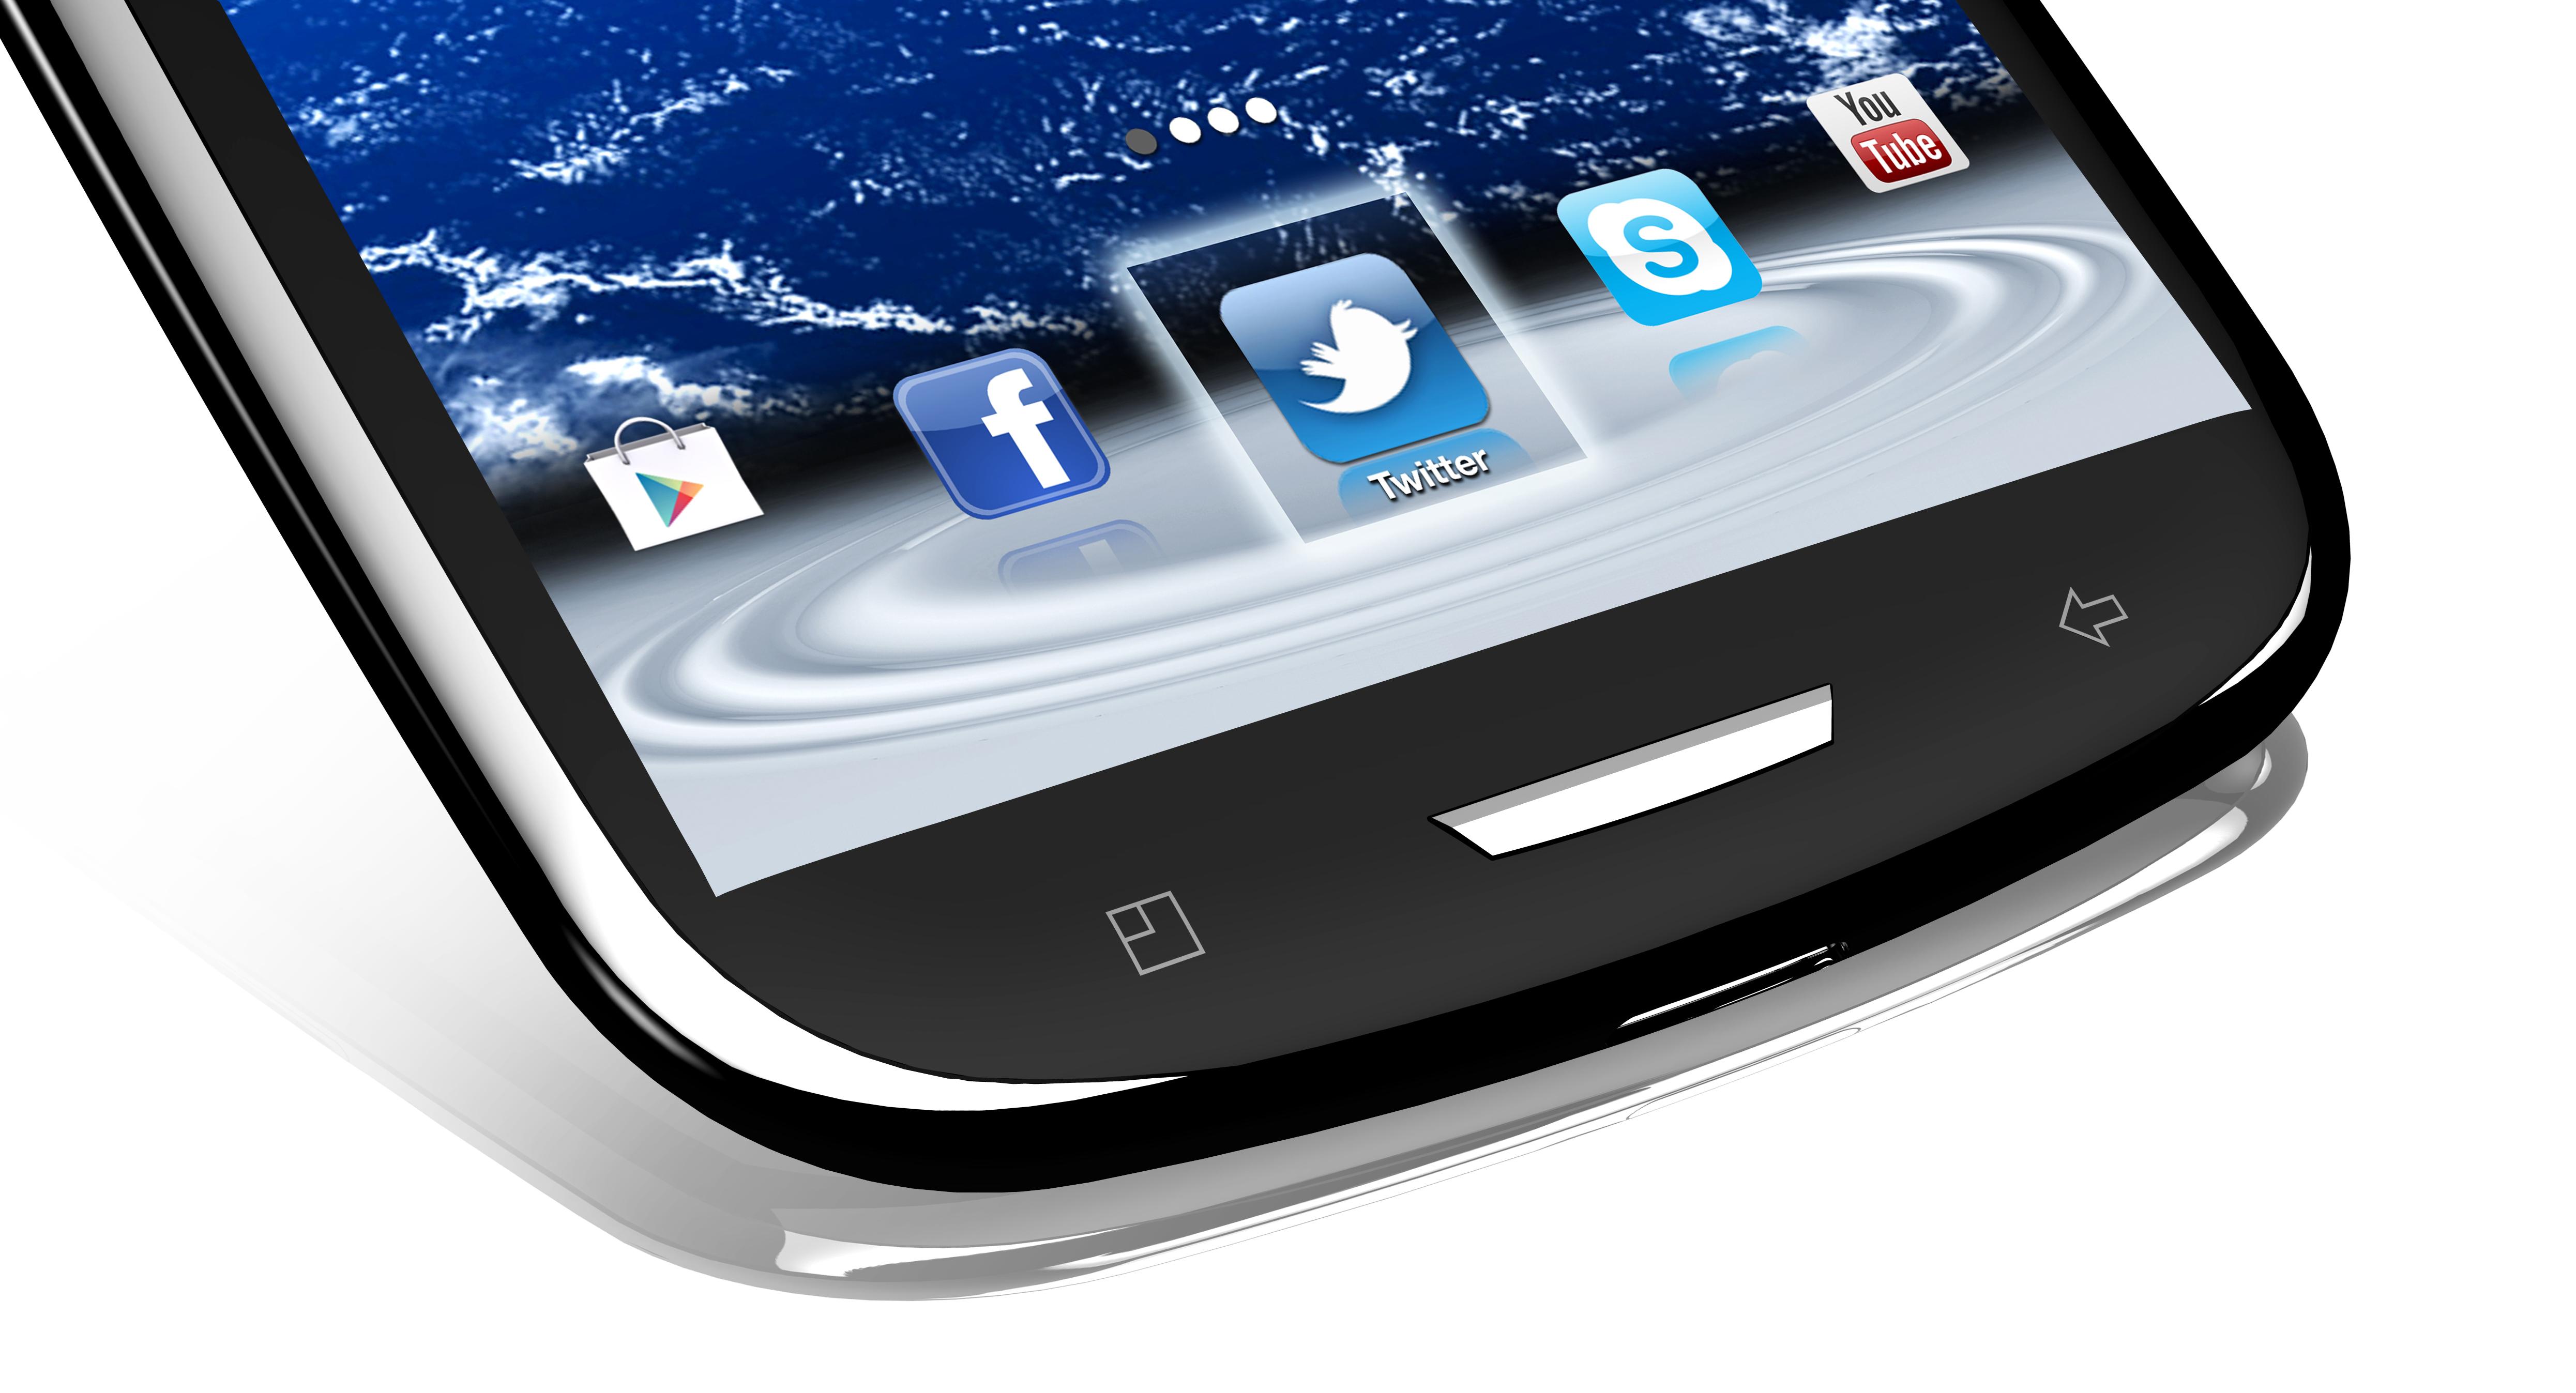 Space Phone 8